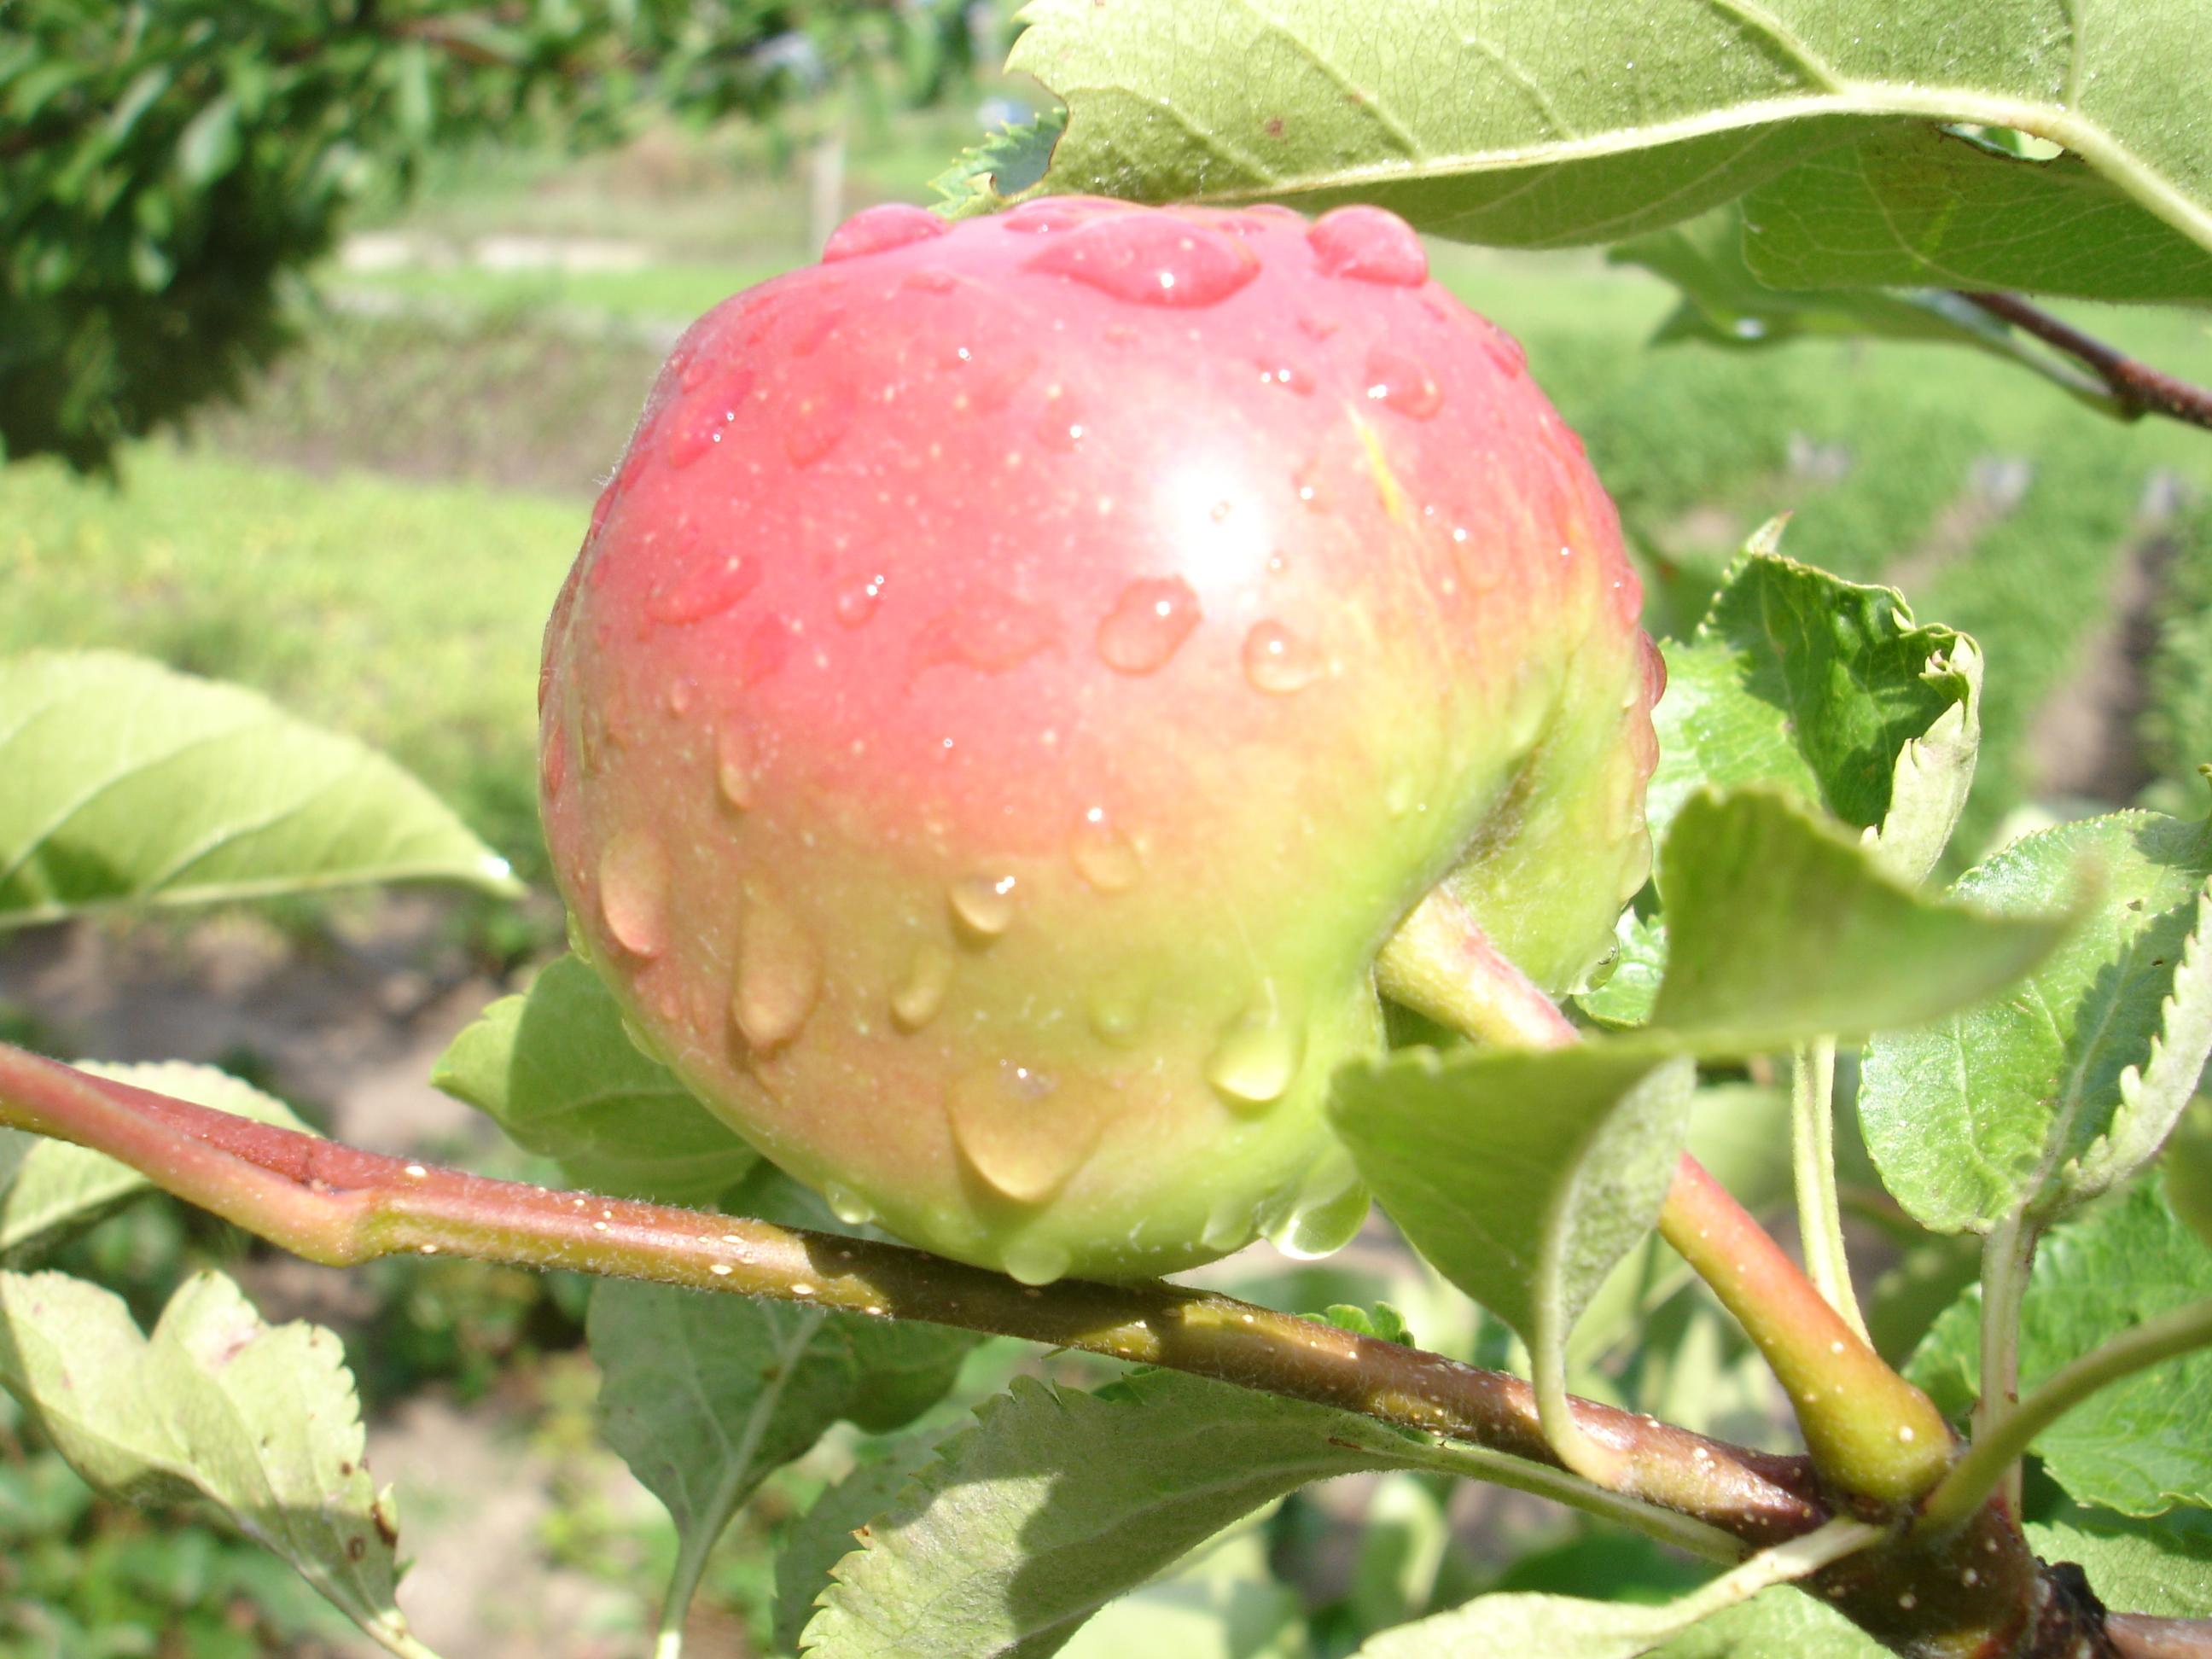 Radioaktivt eple nær Tsjernobyl.